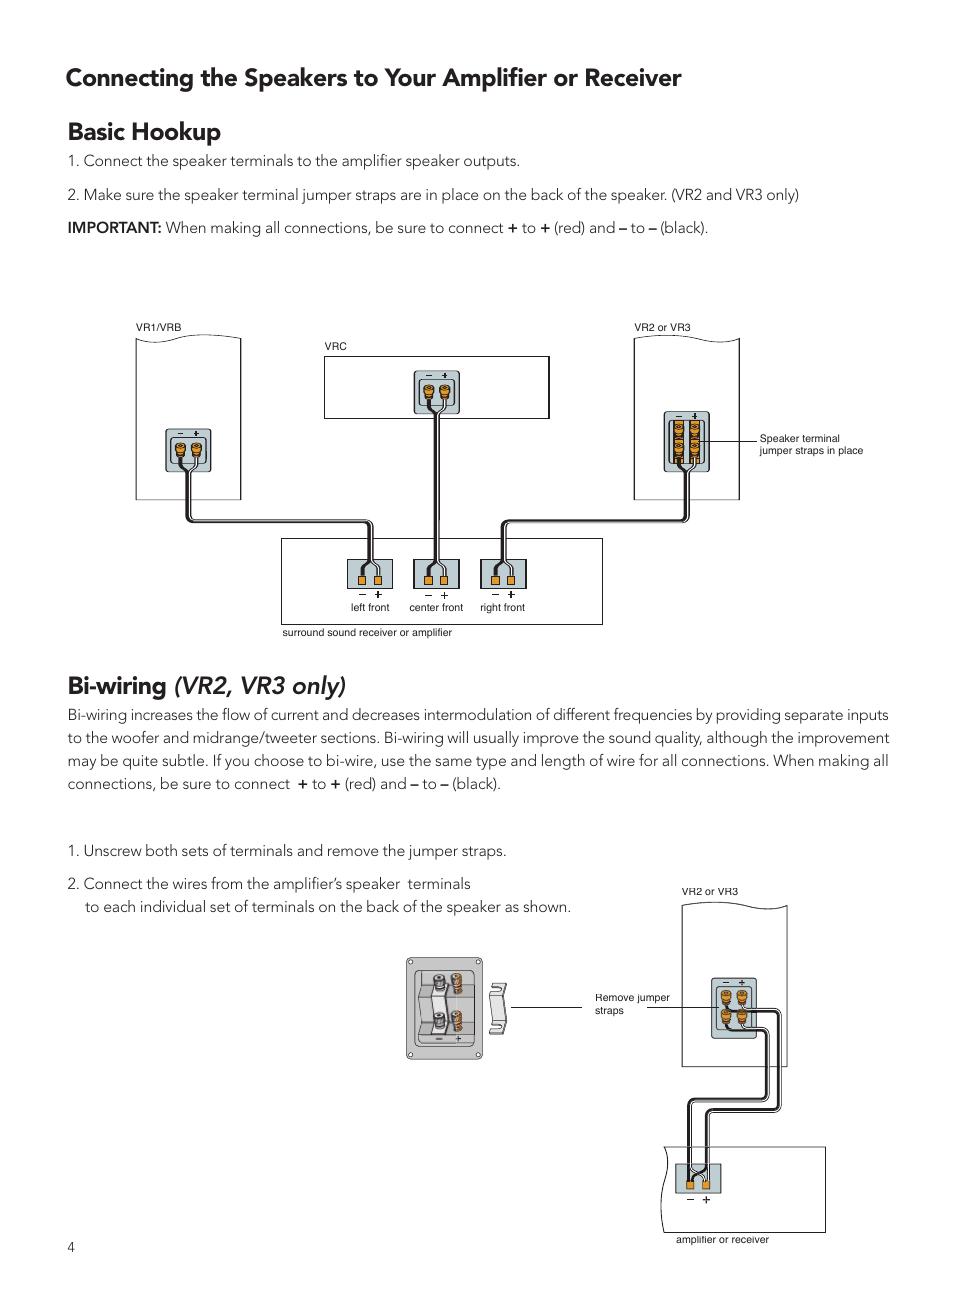 medium resolution of basic hookup bi wiring vr2 vr3 only boston acoustics vrc user manual page 4 8